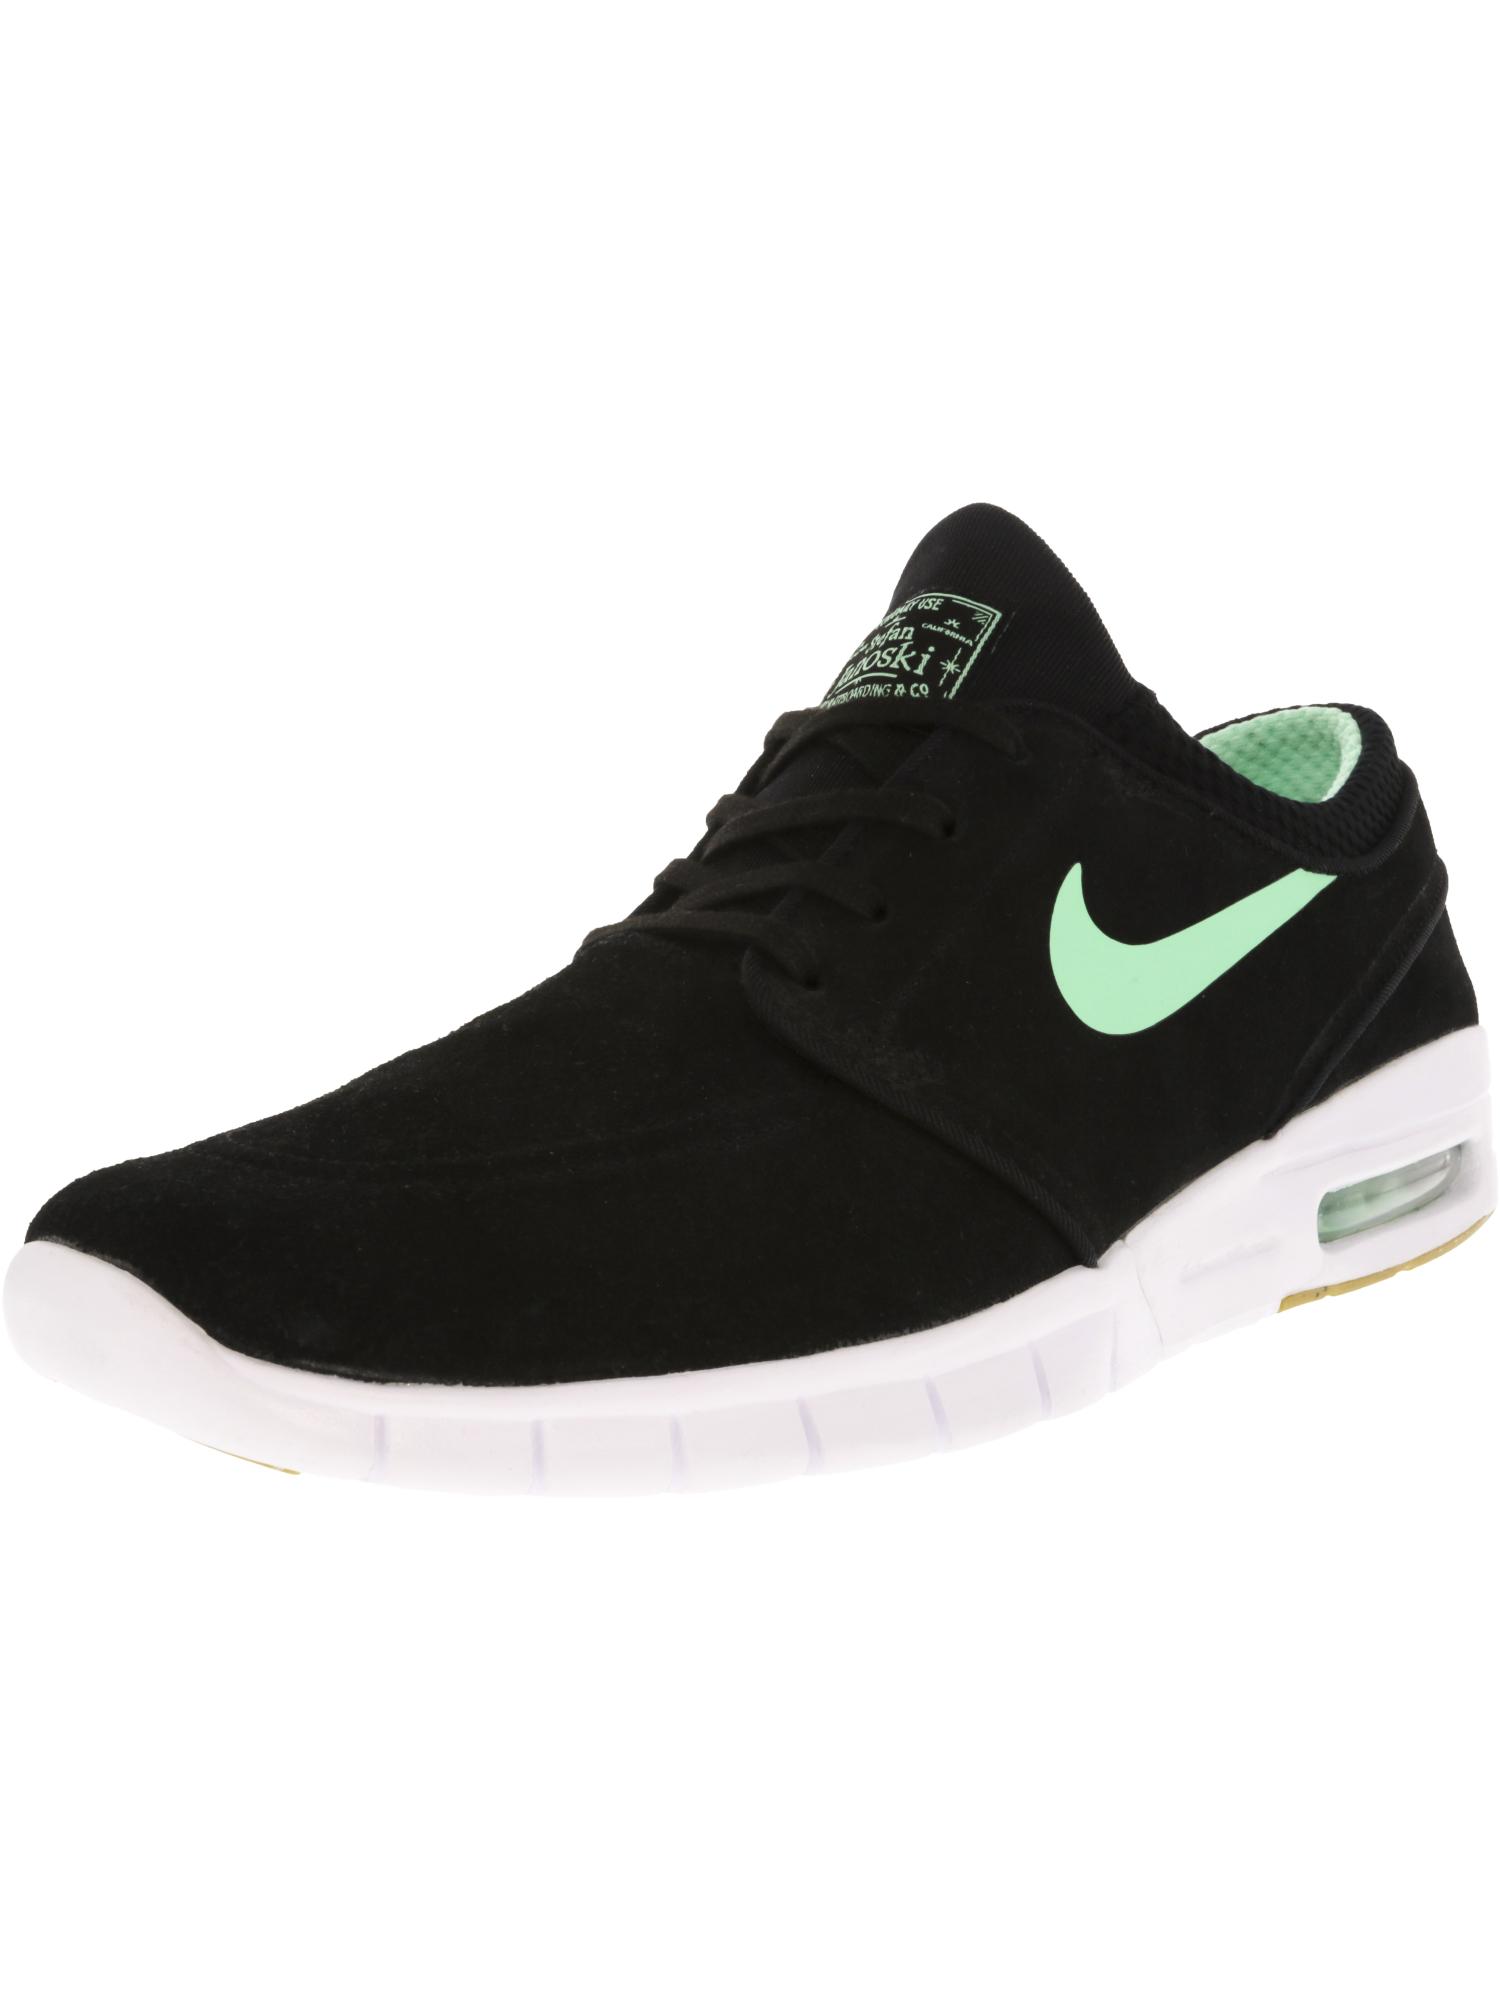 Nike Men's Stefan Janoski Max L Ankle-High Fashion Sneaker; Picture 2 of 2